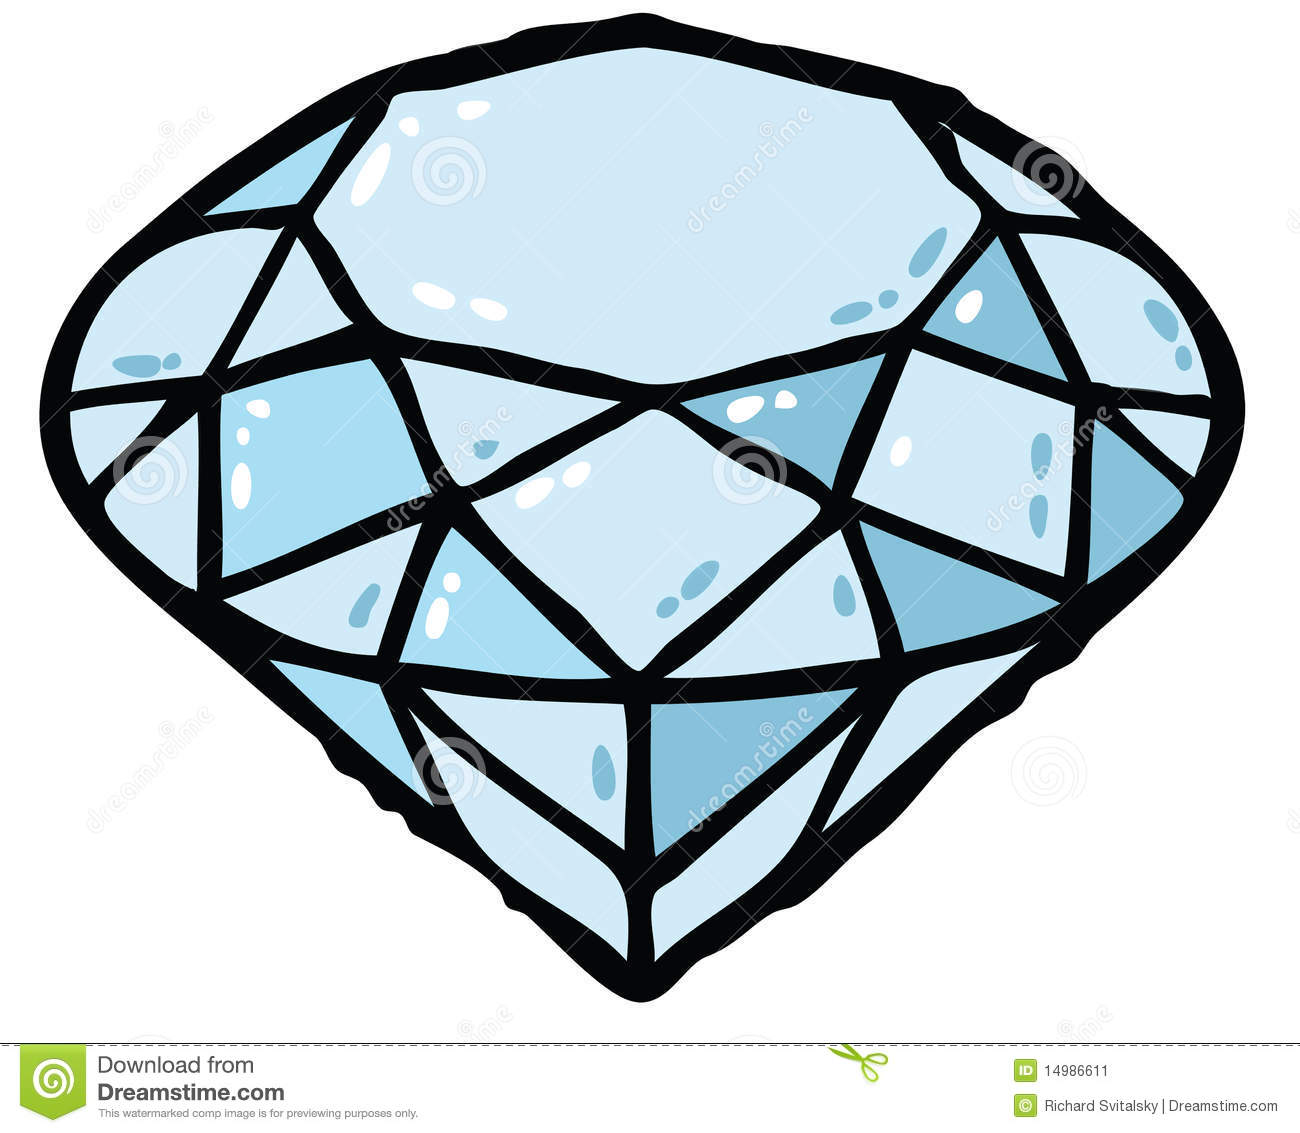 free clip art diamond - photo #31